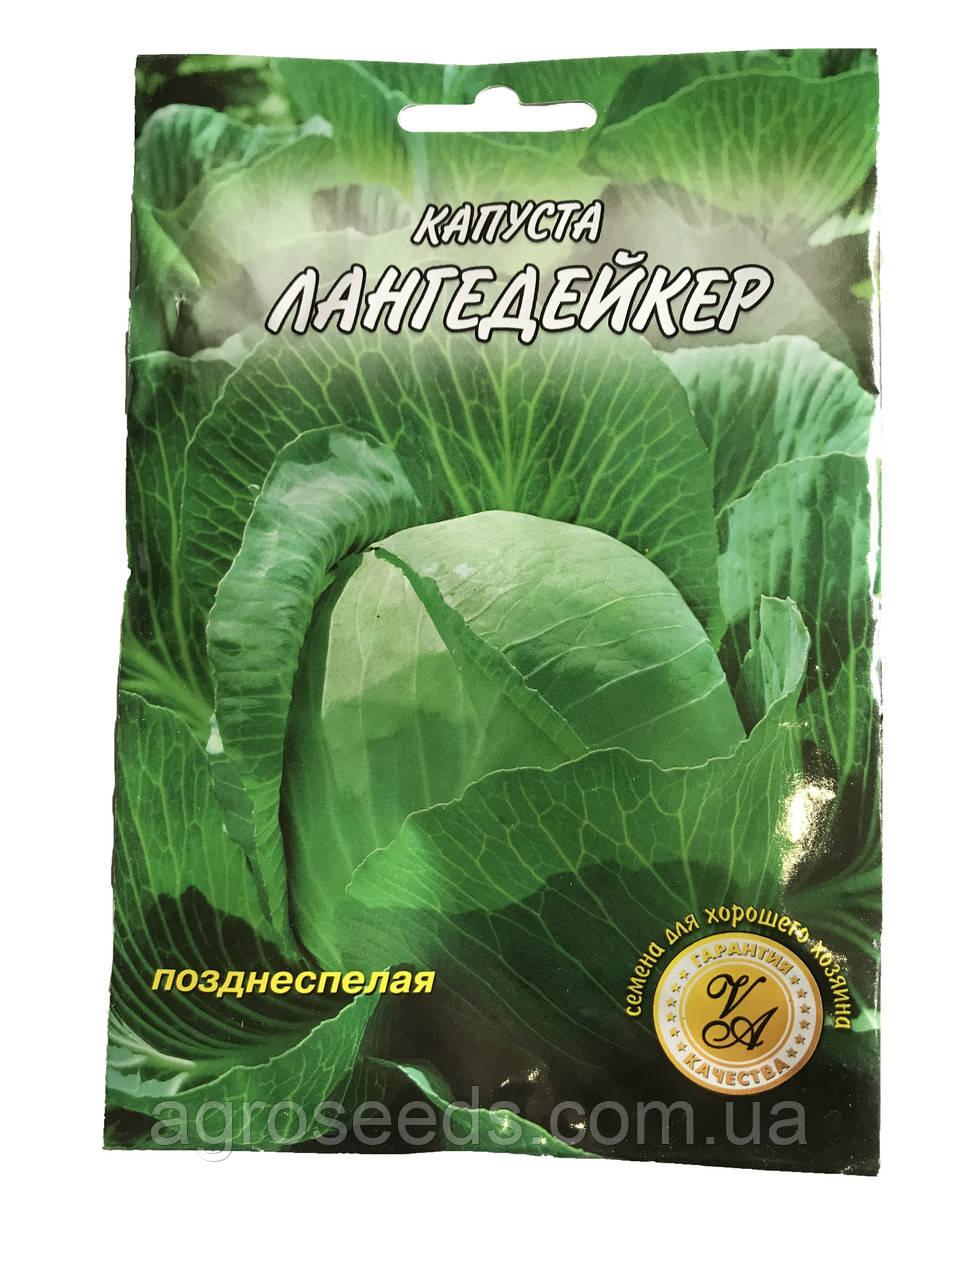 Семена капусты Лангедейкер 5 г